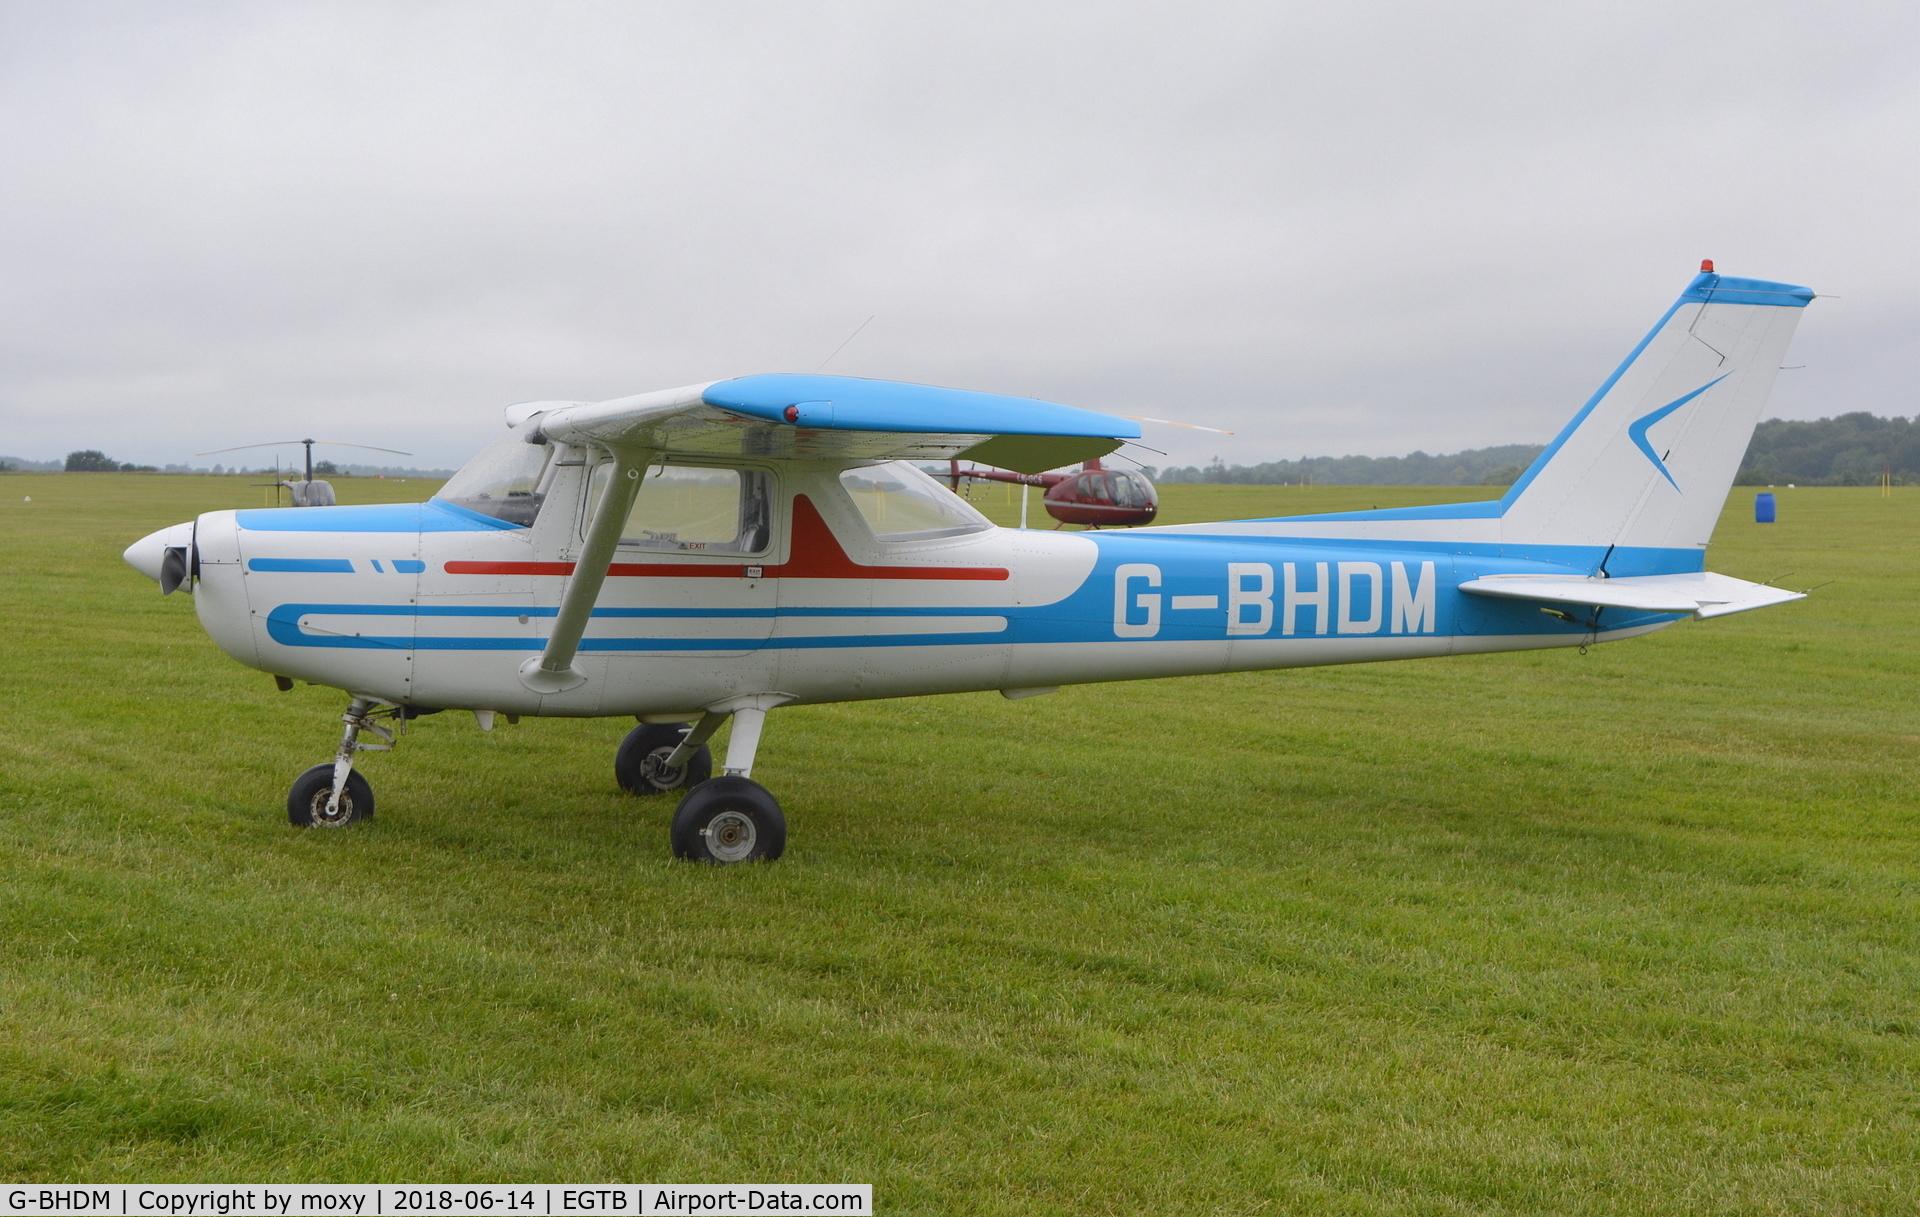 G-BHDM, 1979 Reims F152 C/N 1684, Reims Cessna F152 at Wycombe Air Park.